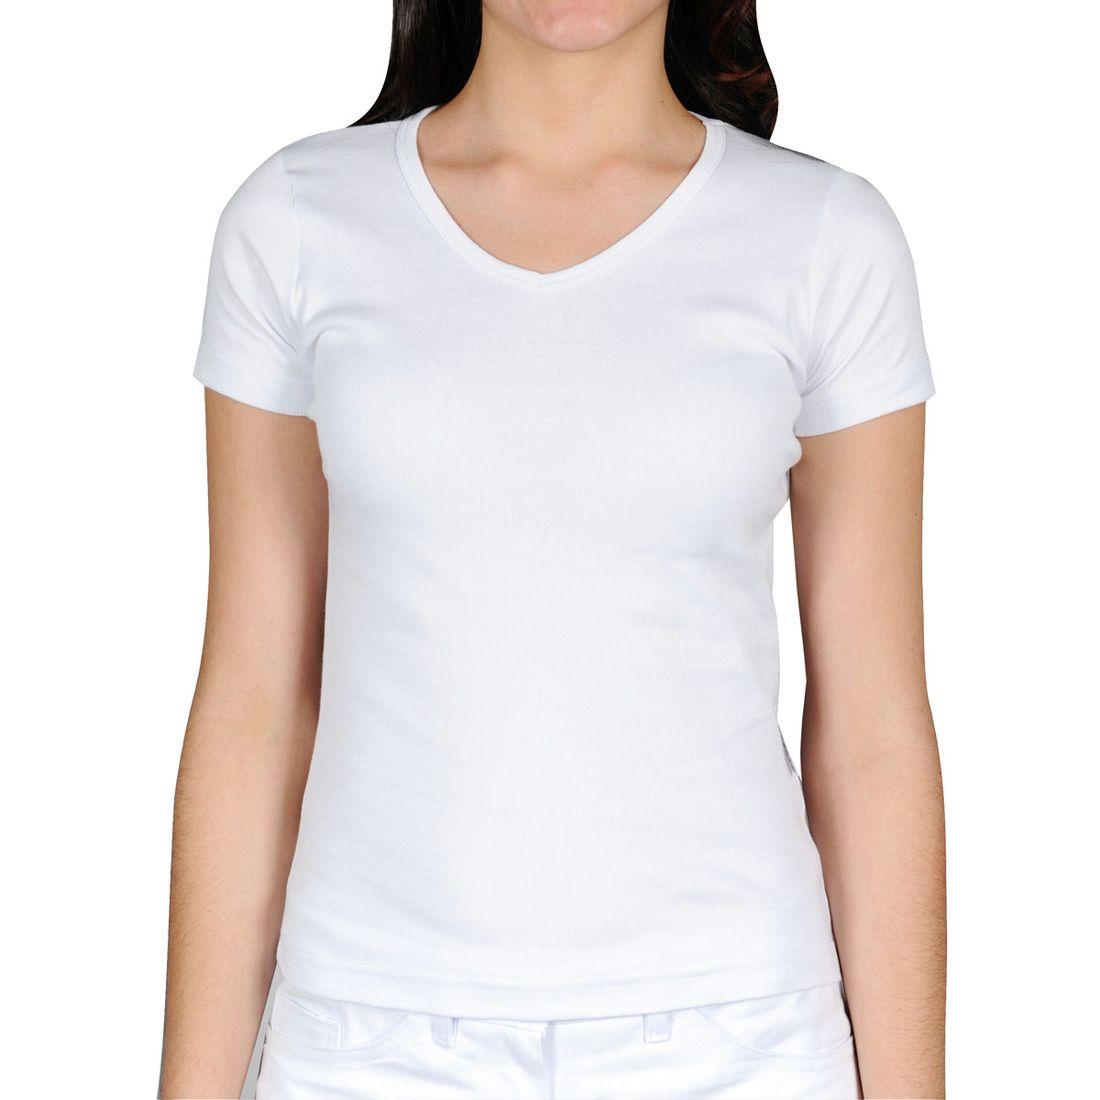 Camiseta Canelada Manga Curta Feminina Gola V Branca - poetique 1e2b57cc5f432